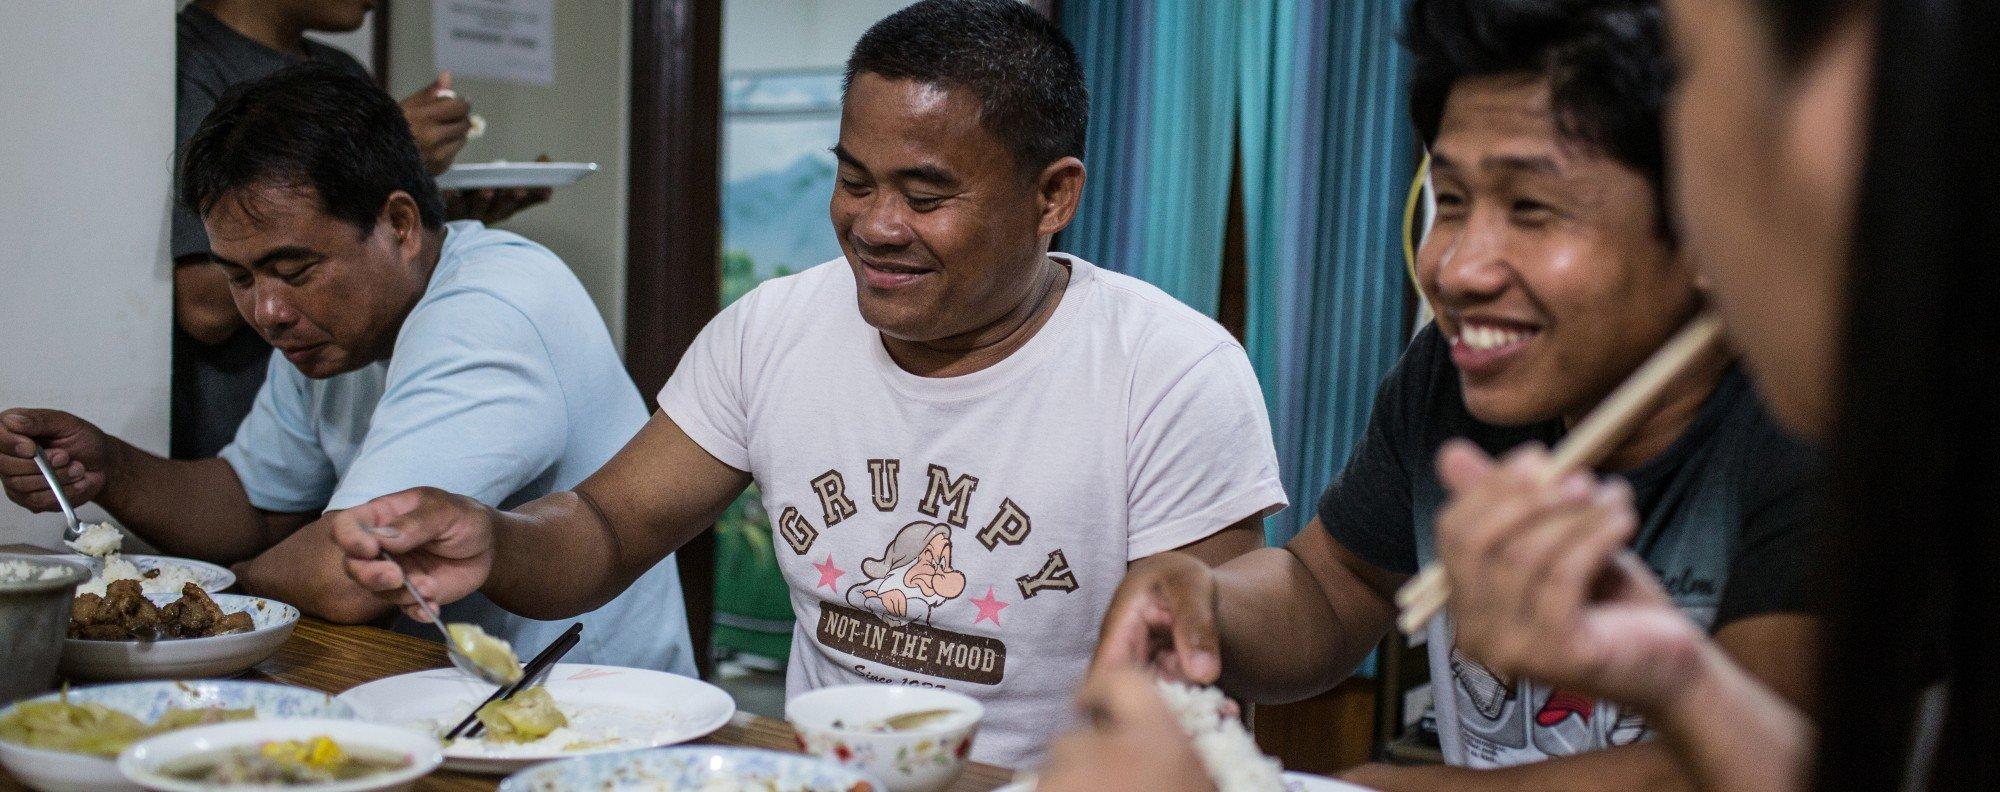 Filipino fishermen at a shelter after facing abuse in Taiwan.